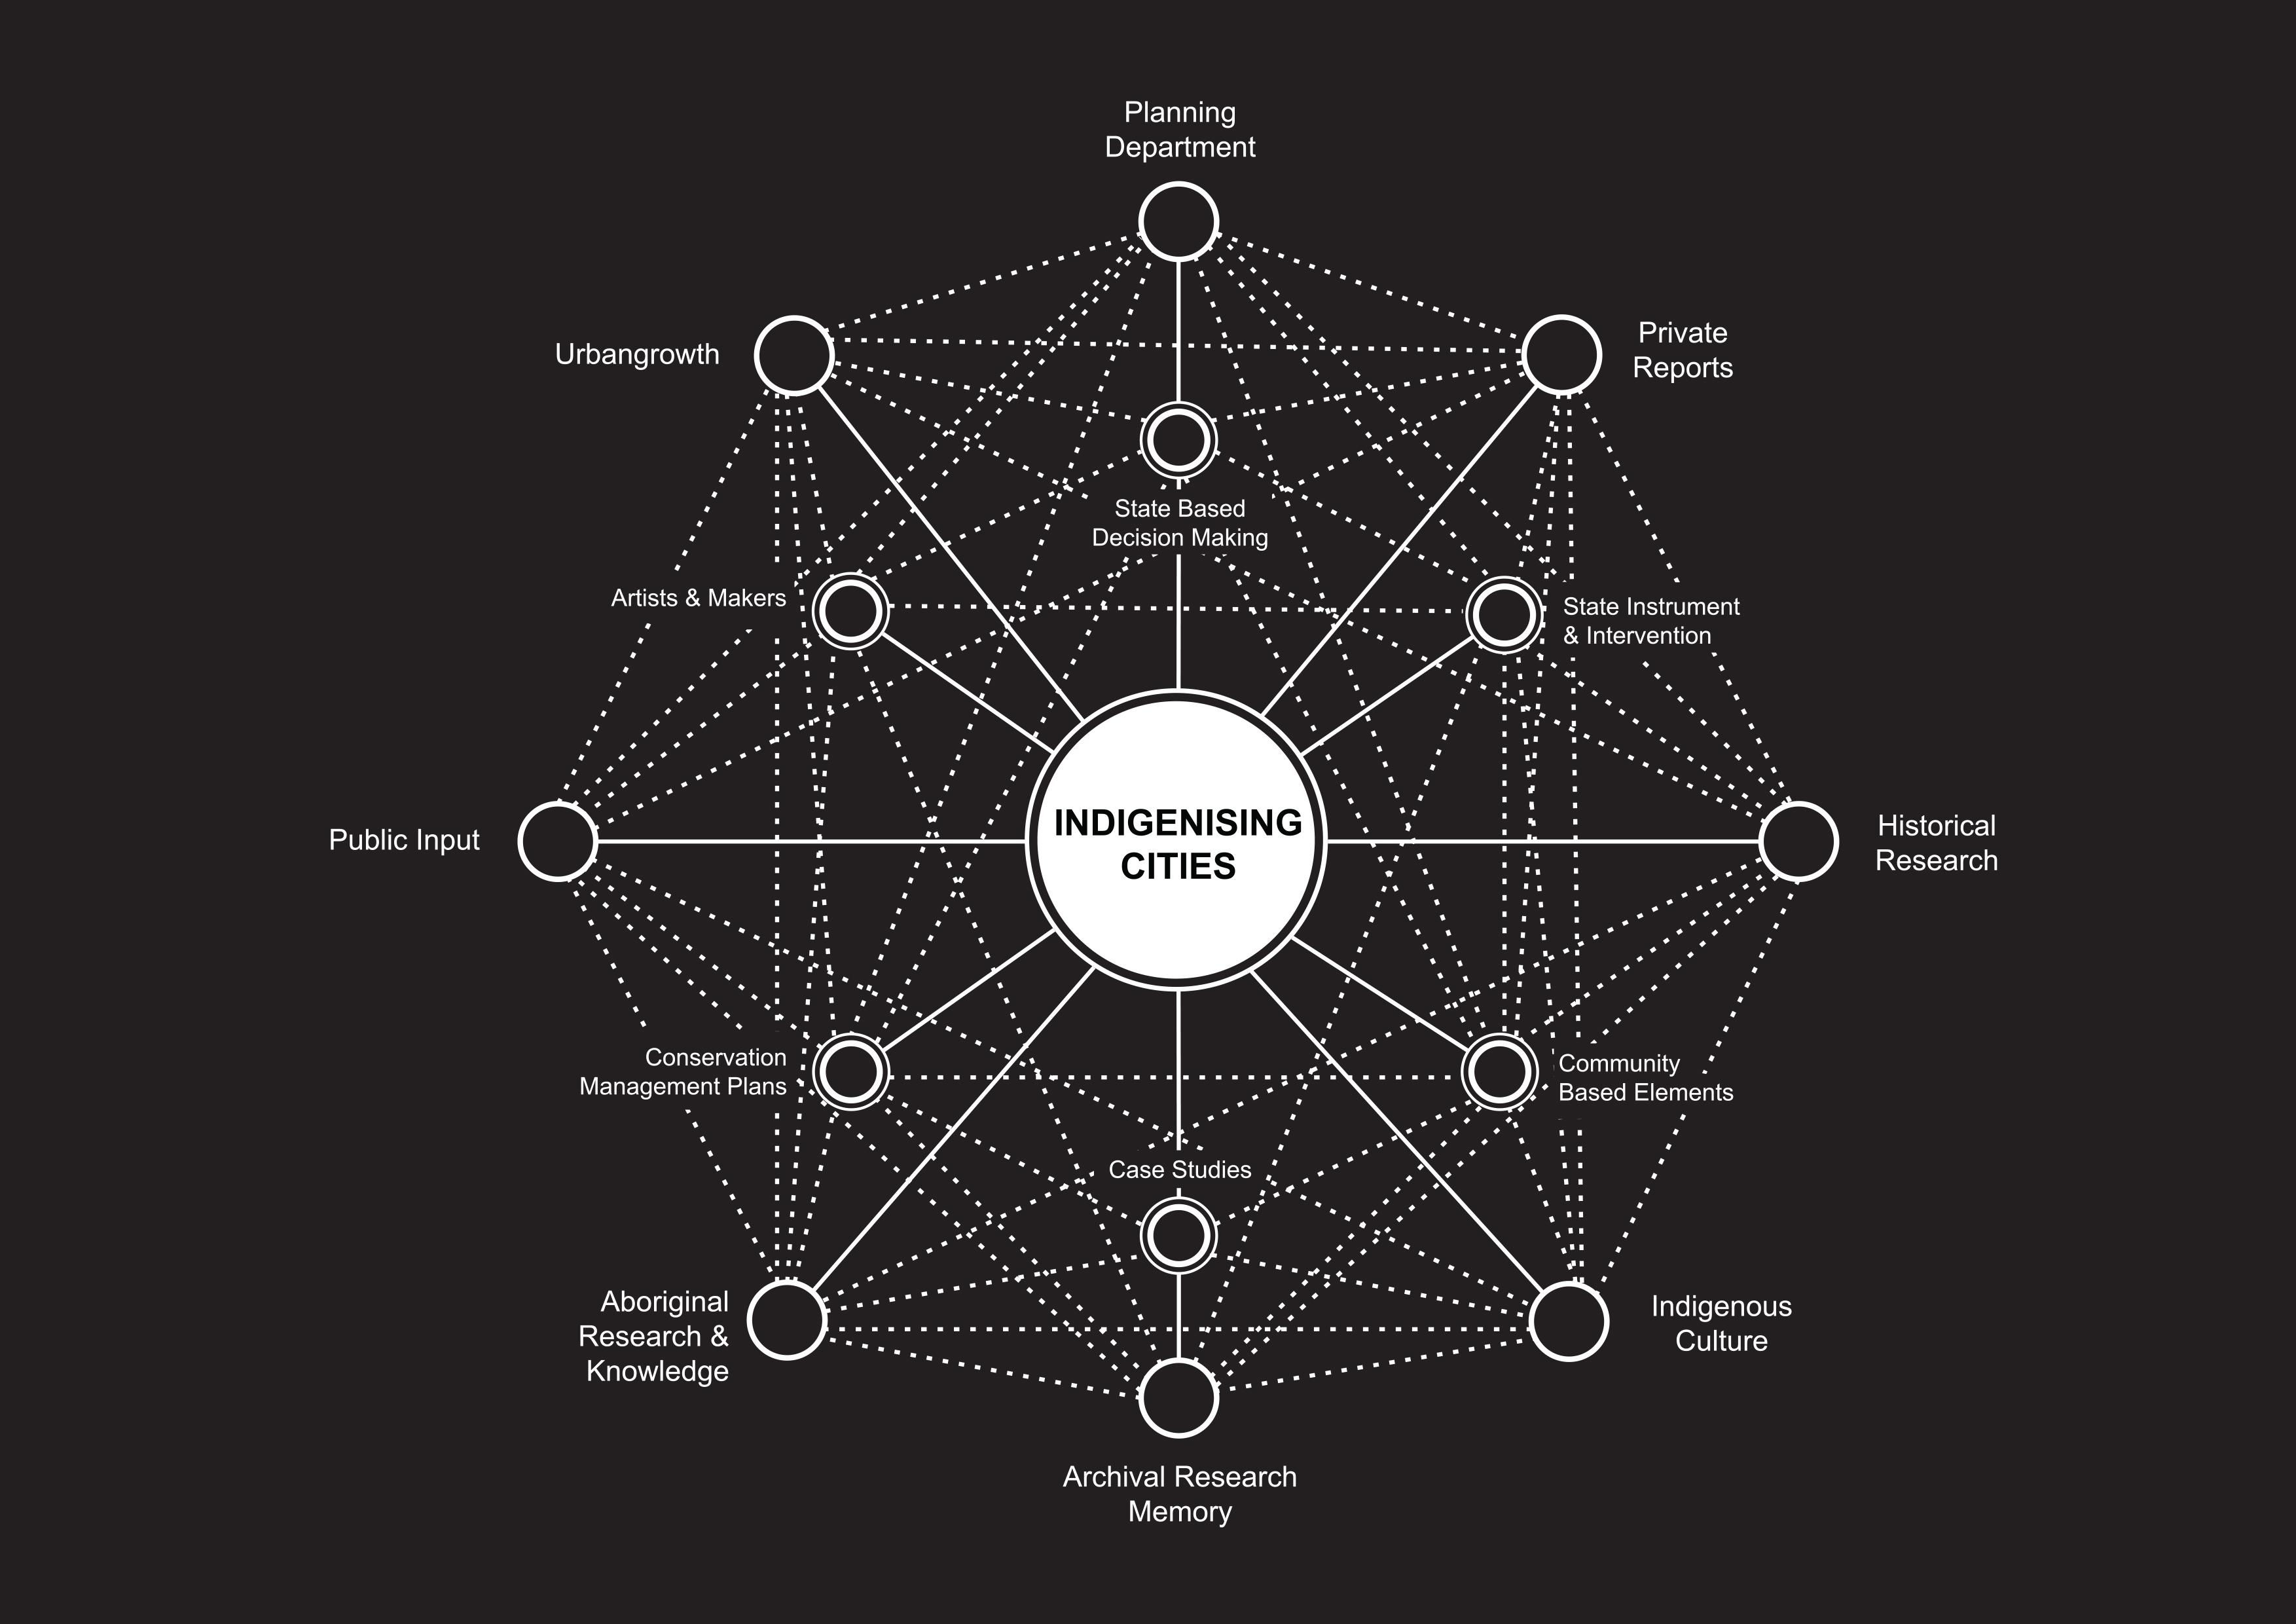 Indigenising Planning Model - Hardy, di Gravio & Robertson Updated 2016 (Created by Beau Hardy)